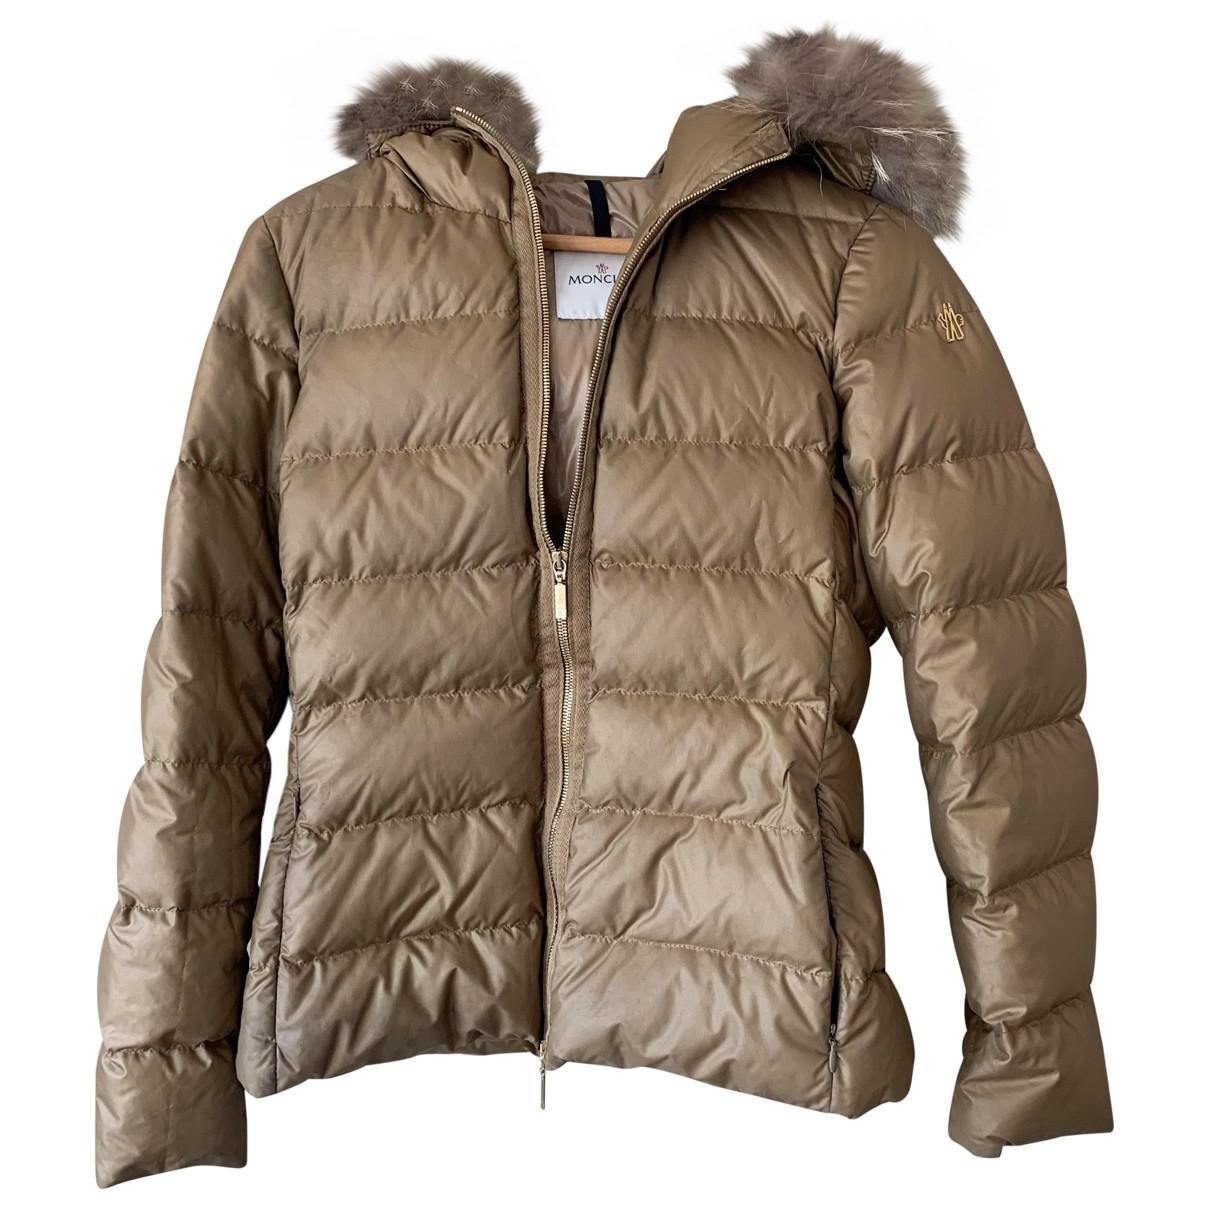 Moncler \N Brown jacket for Women M International